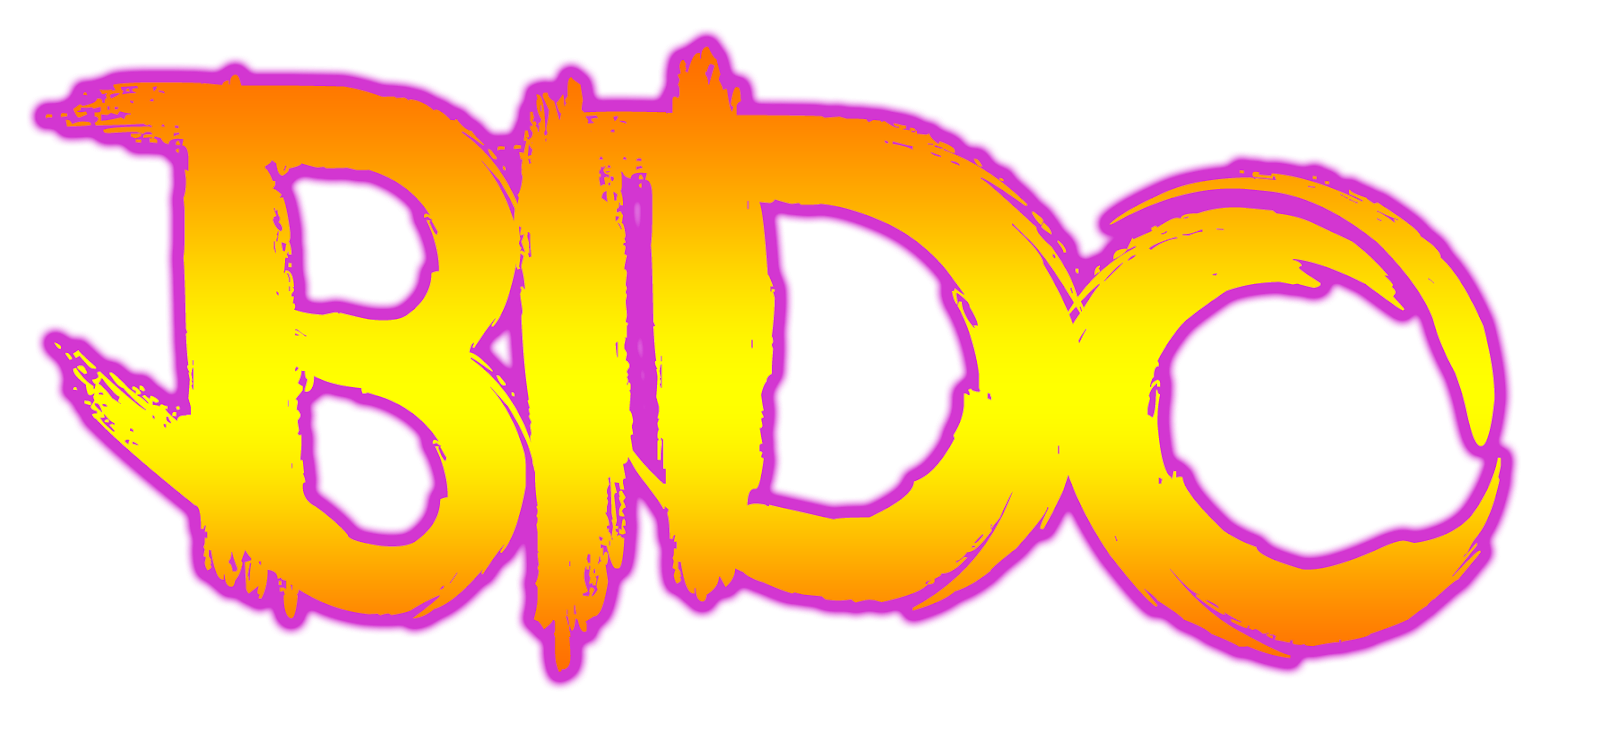 Bollyindiandjsclub Logo